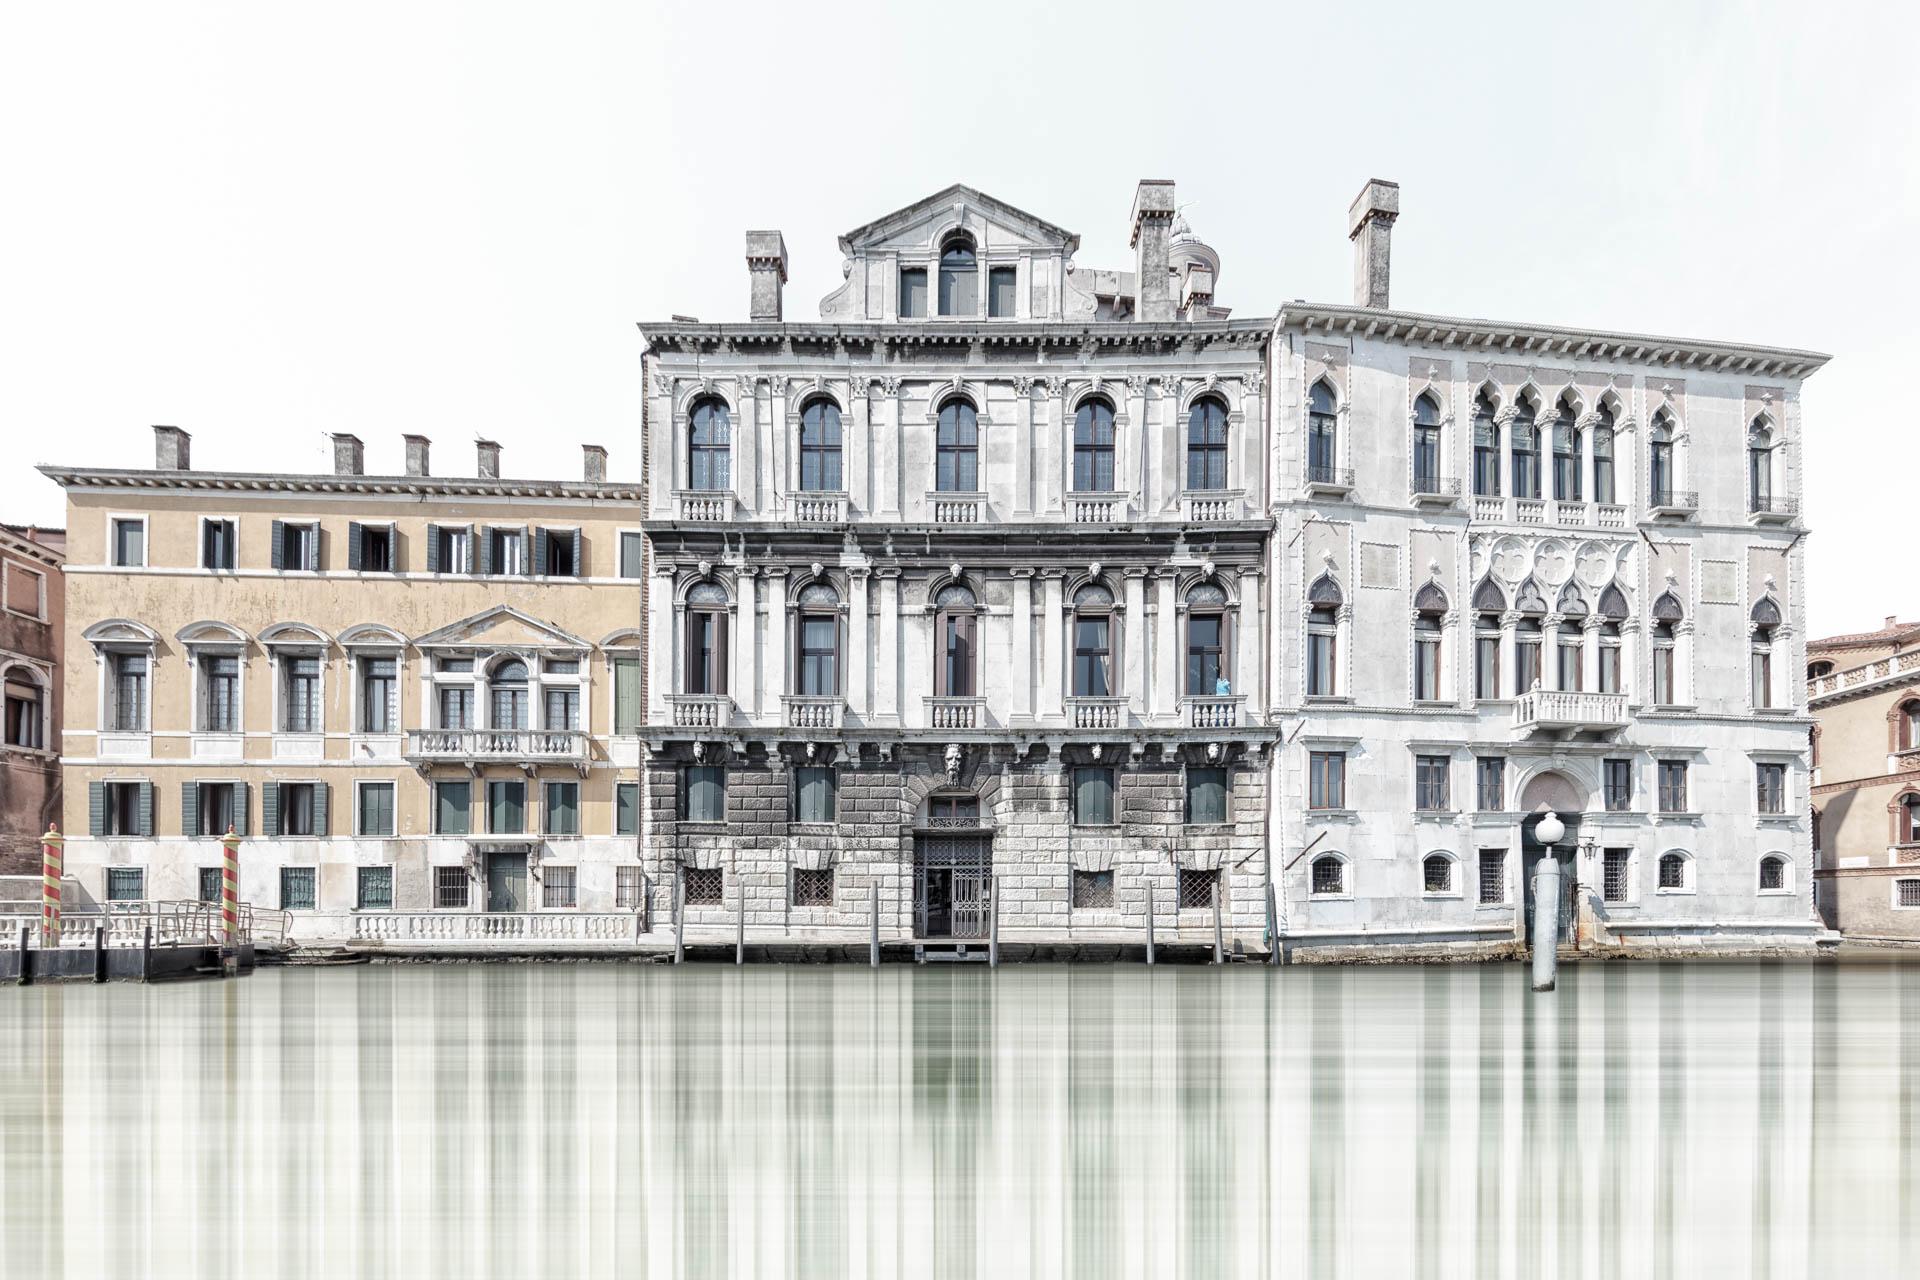 LDKphoto-Palais Contarini degli Scrigni.jpg